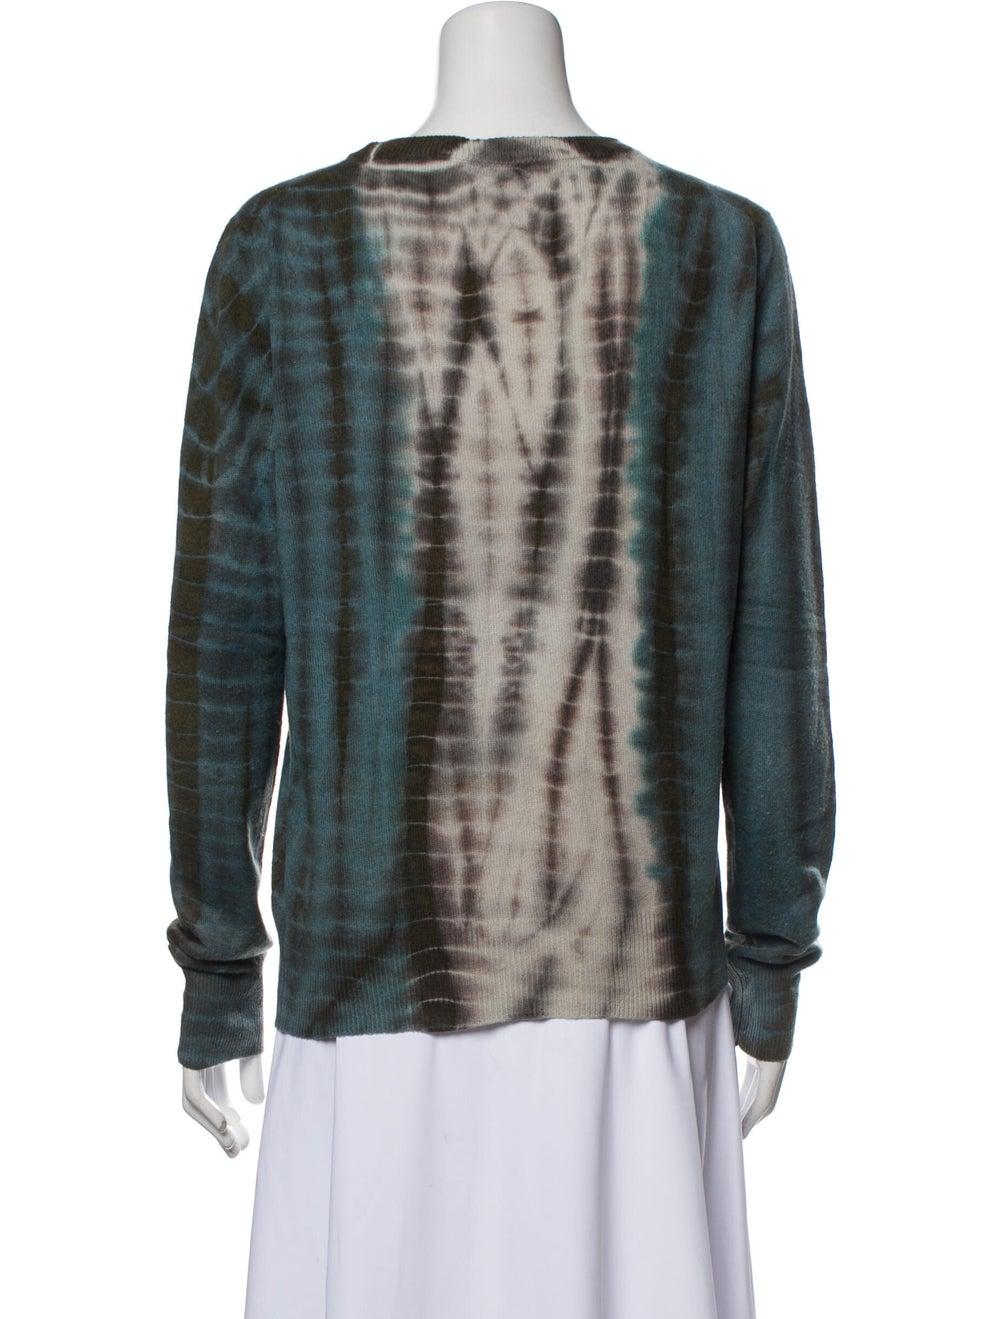 Libertine Cashmere Tie-Dye Print Sweater Blue - image 3